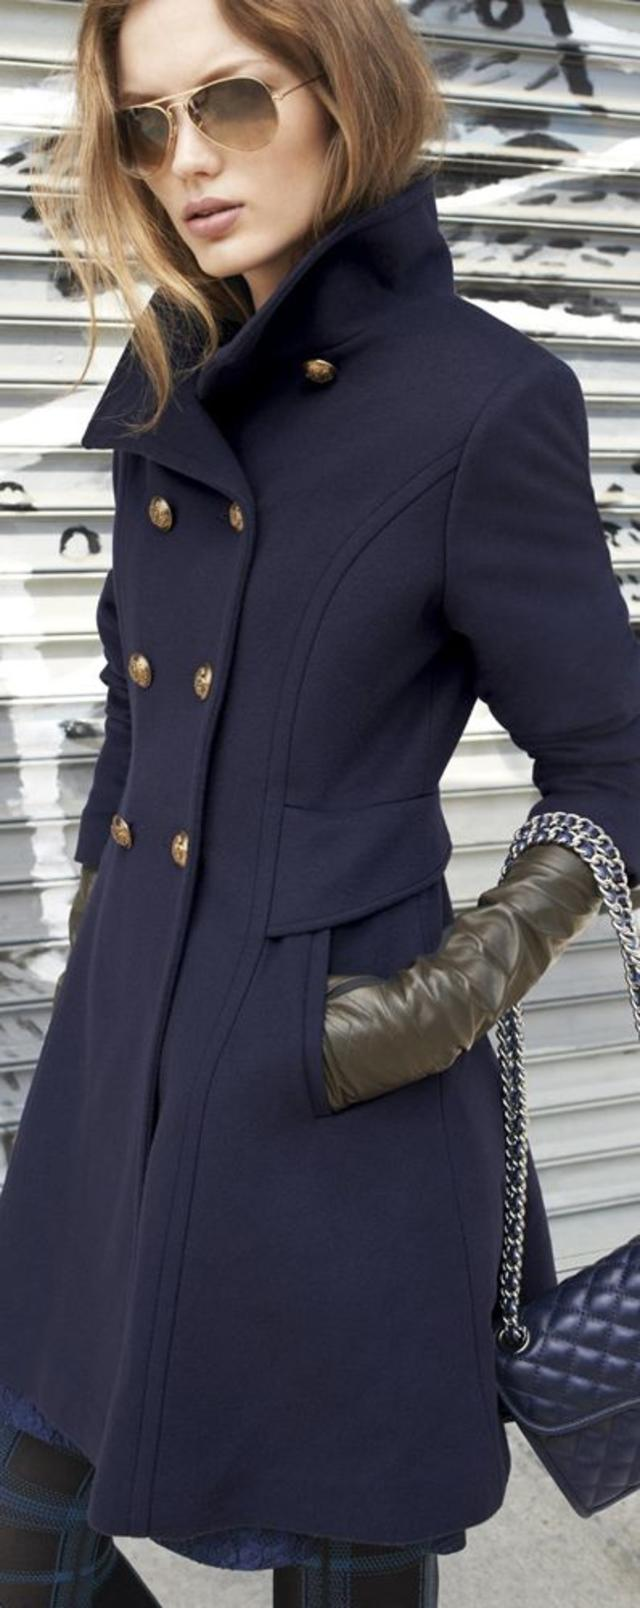 Trina Turk Officers Coat & Accessories